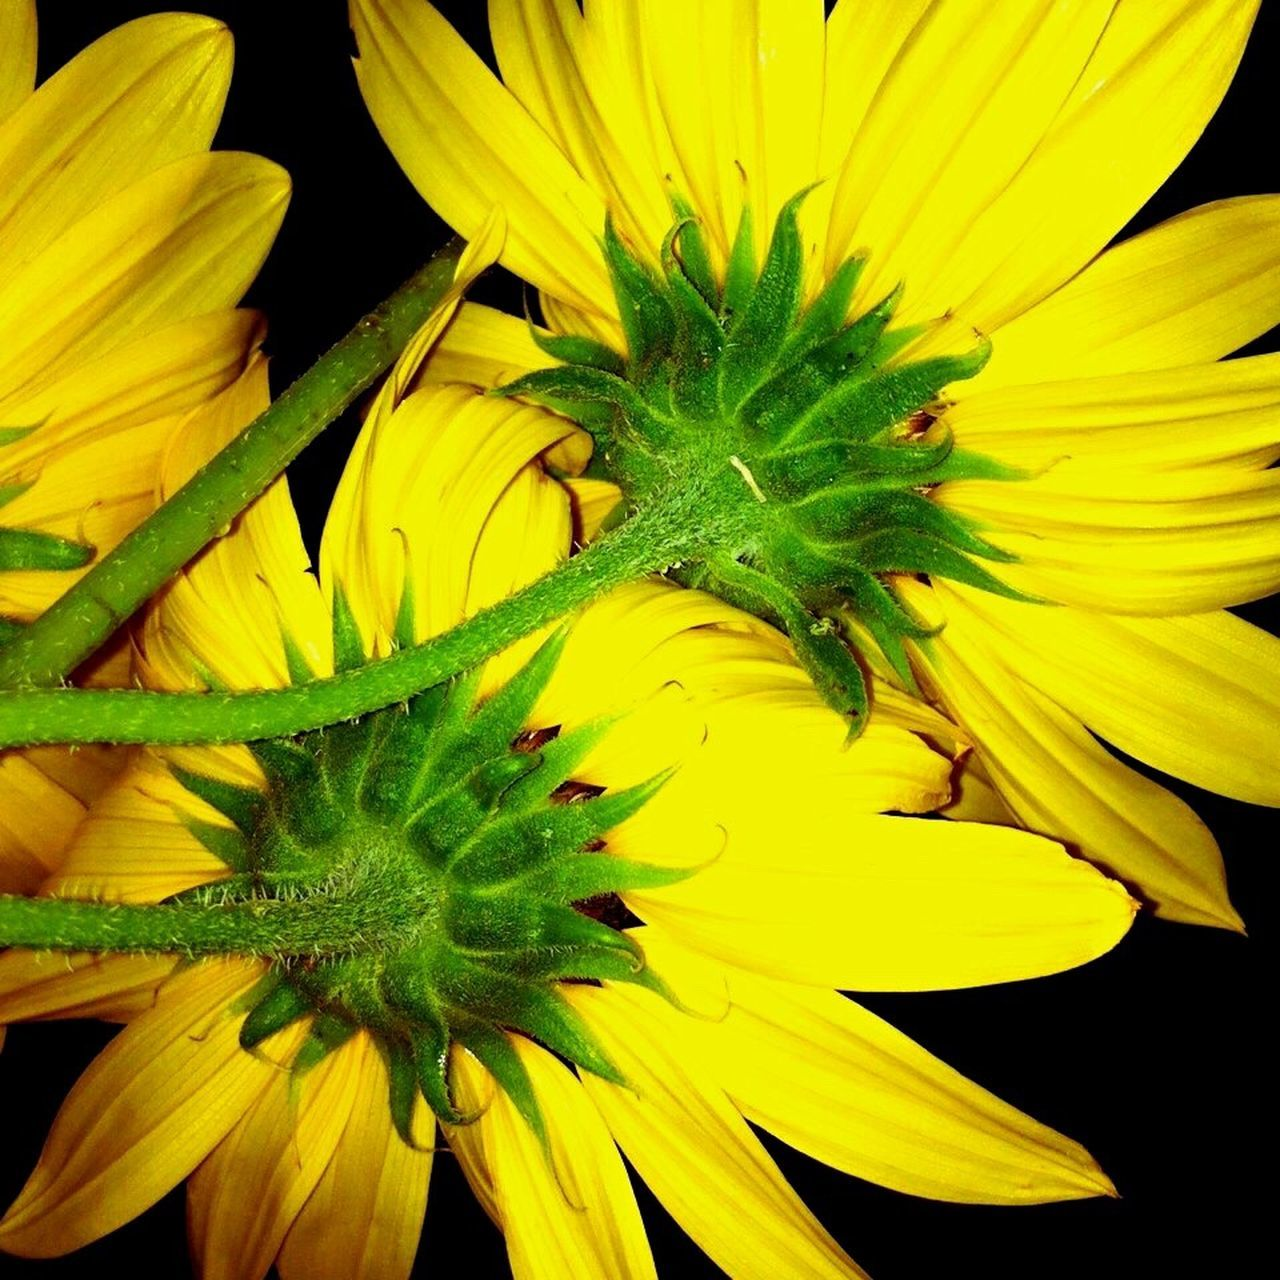 Yellow Yellow Flowers Sunflowers Lookingup Ckose Up Texas Wildflowers